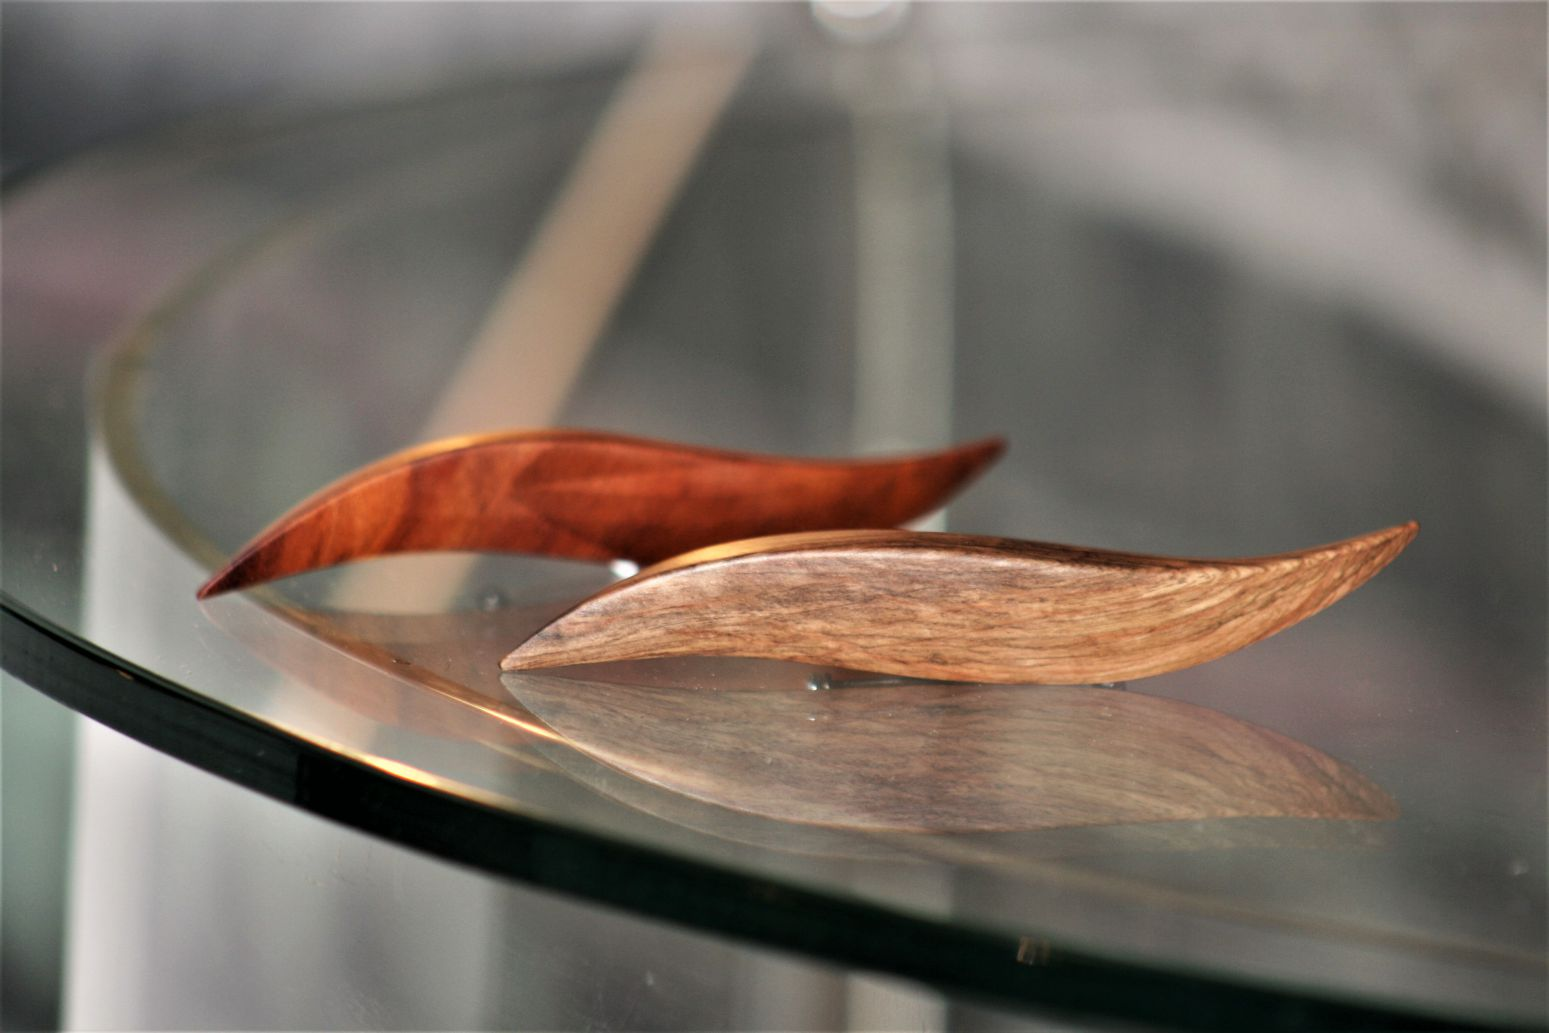 wooden brooches jewellery Lyre Mediterranean holm oak cherry plum wood unique handmade sanisio artist design jewelry